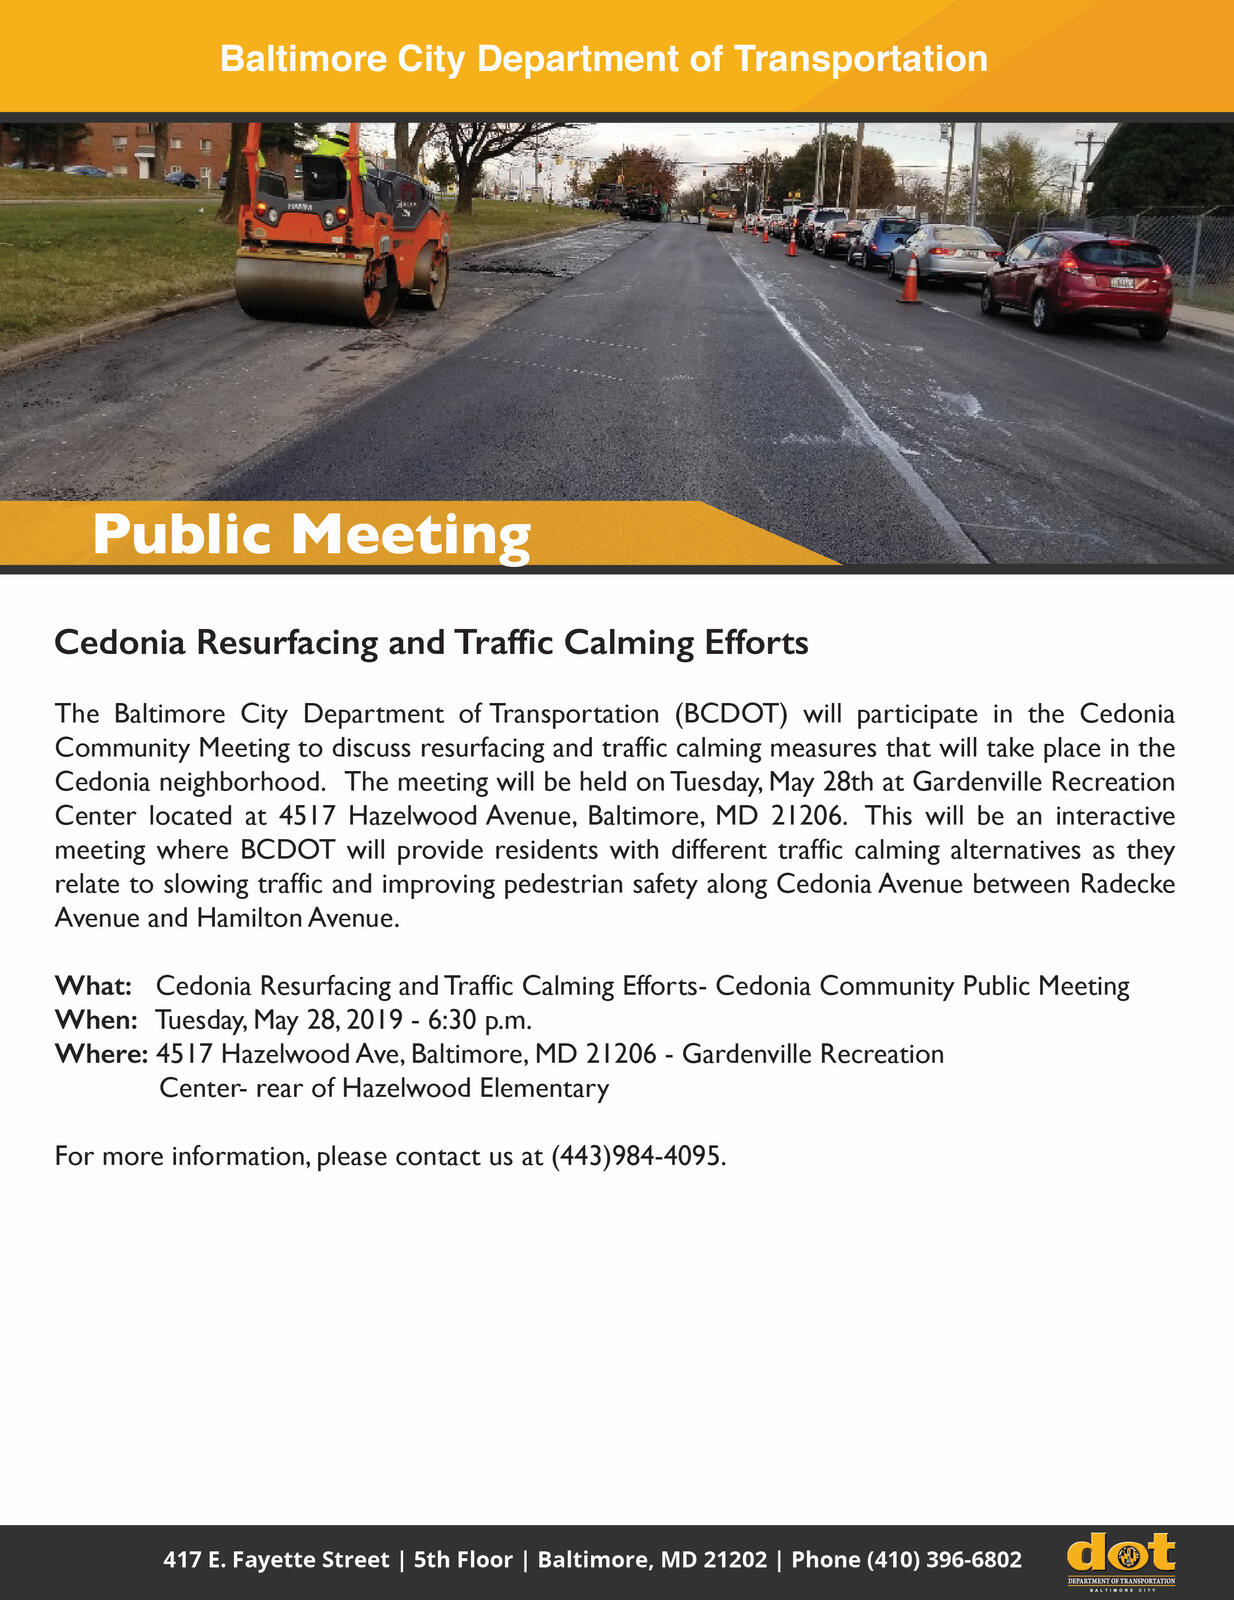 BCDOT to Discuss Upcoming Resurfacing and Traffic Calming